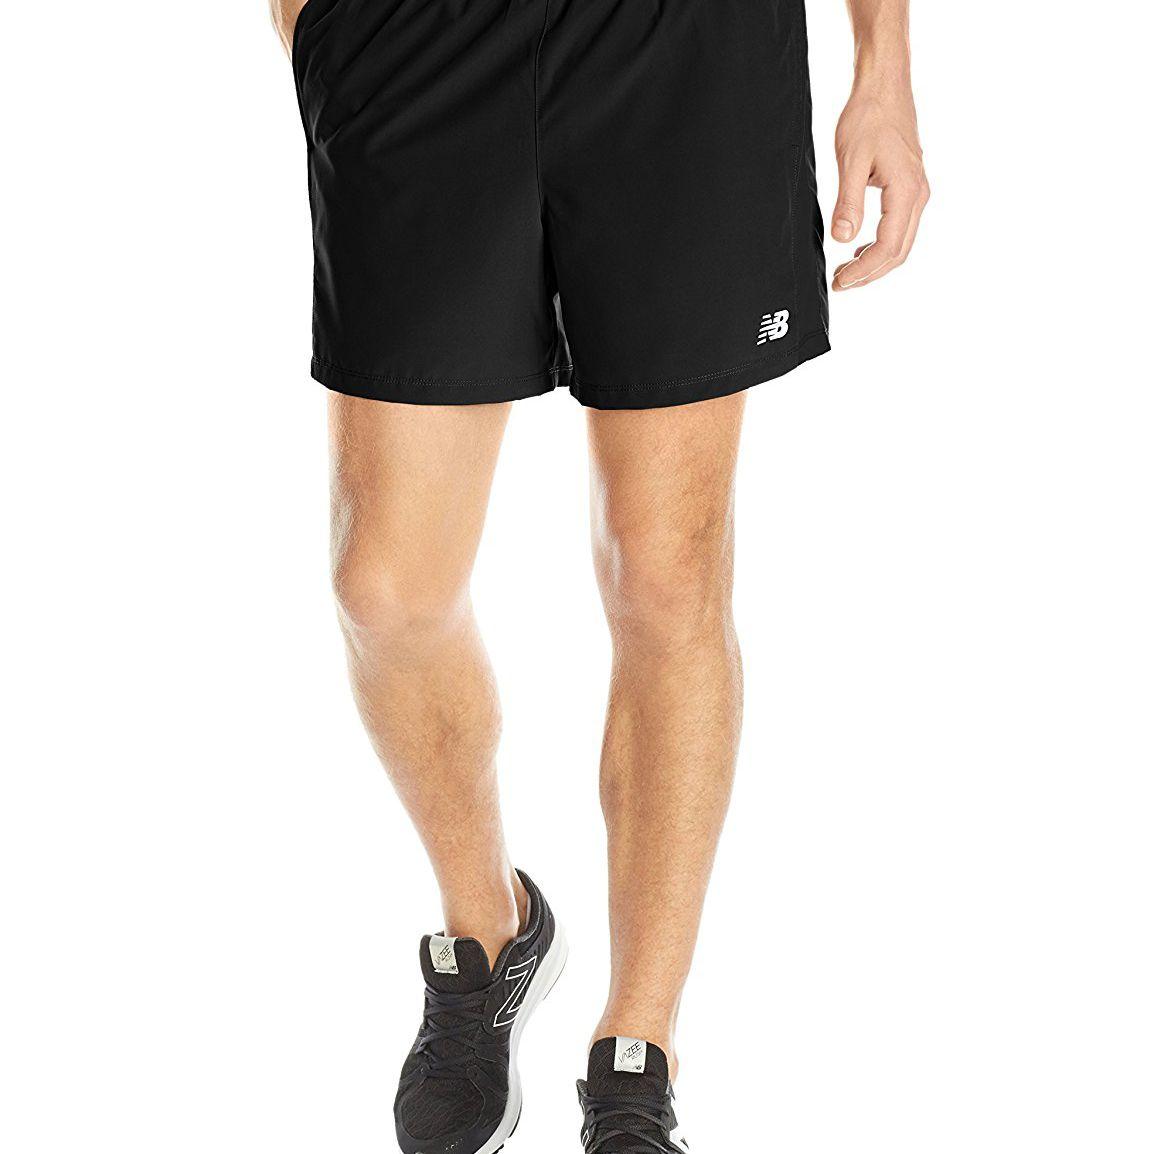 nike shorts 7 inch inseam